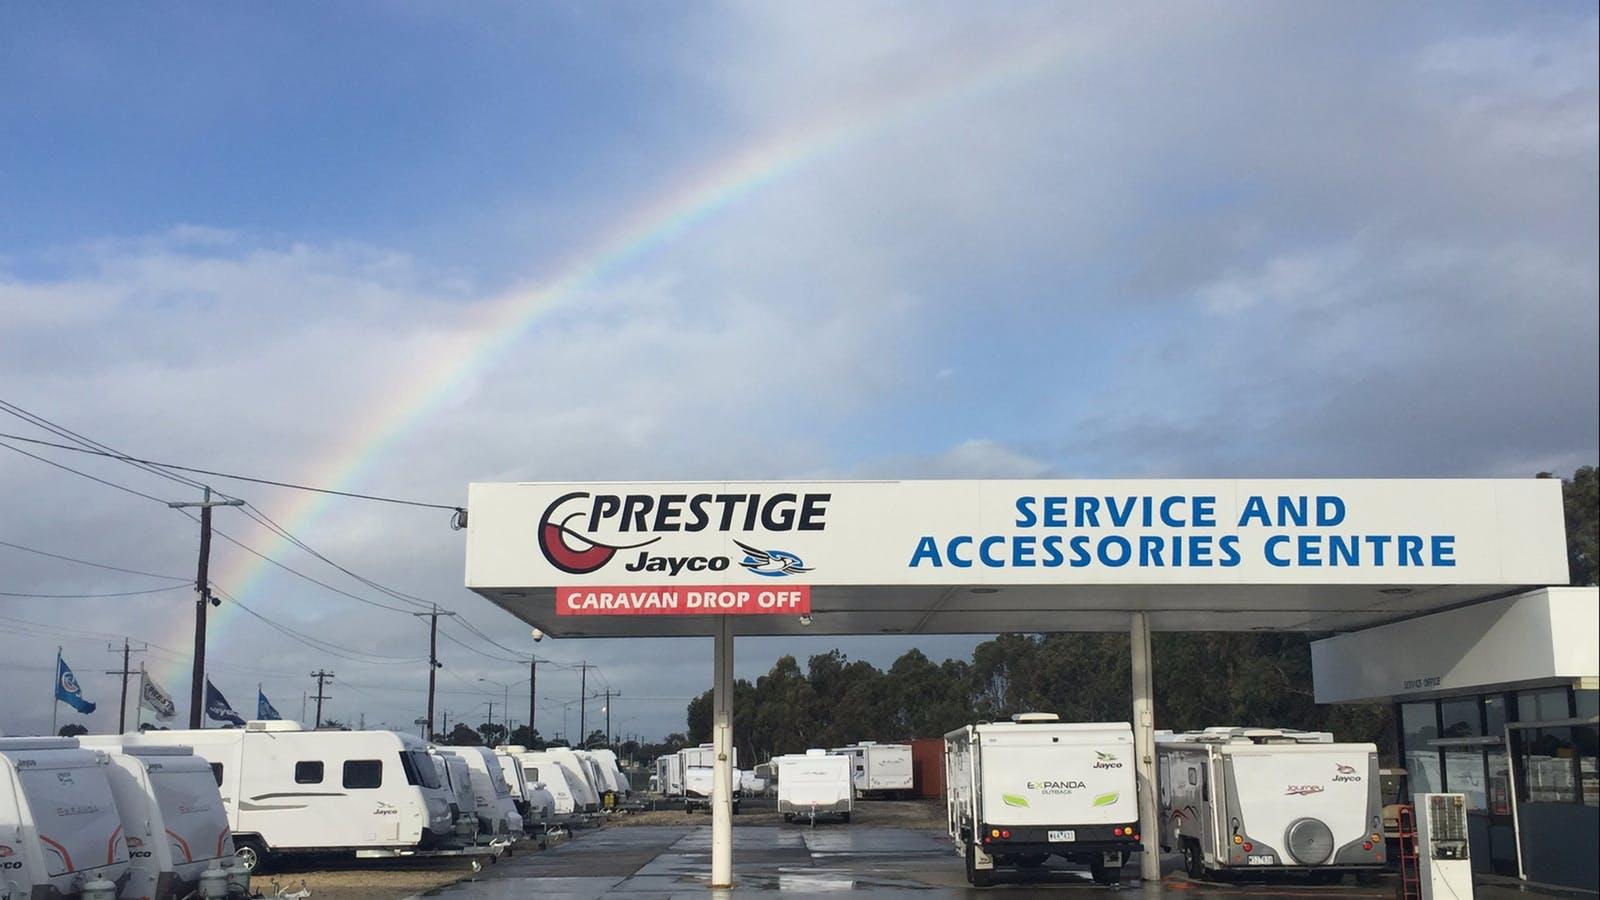 Prestige Jayco Service, Accessories, Warranties Area